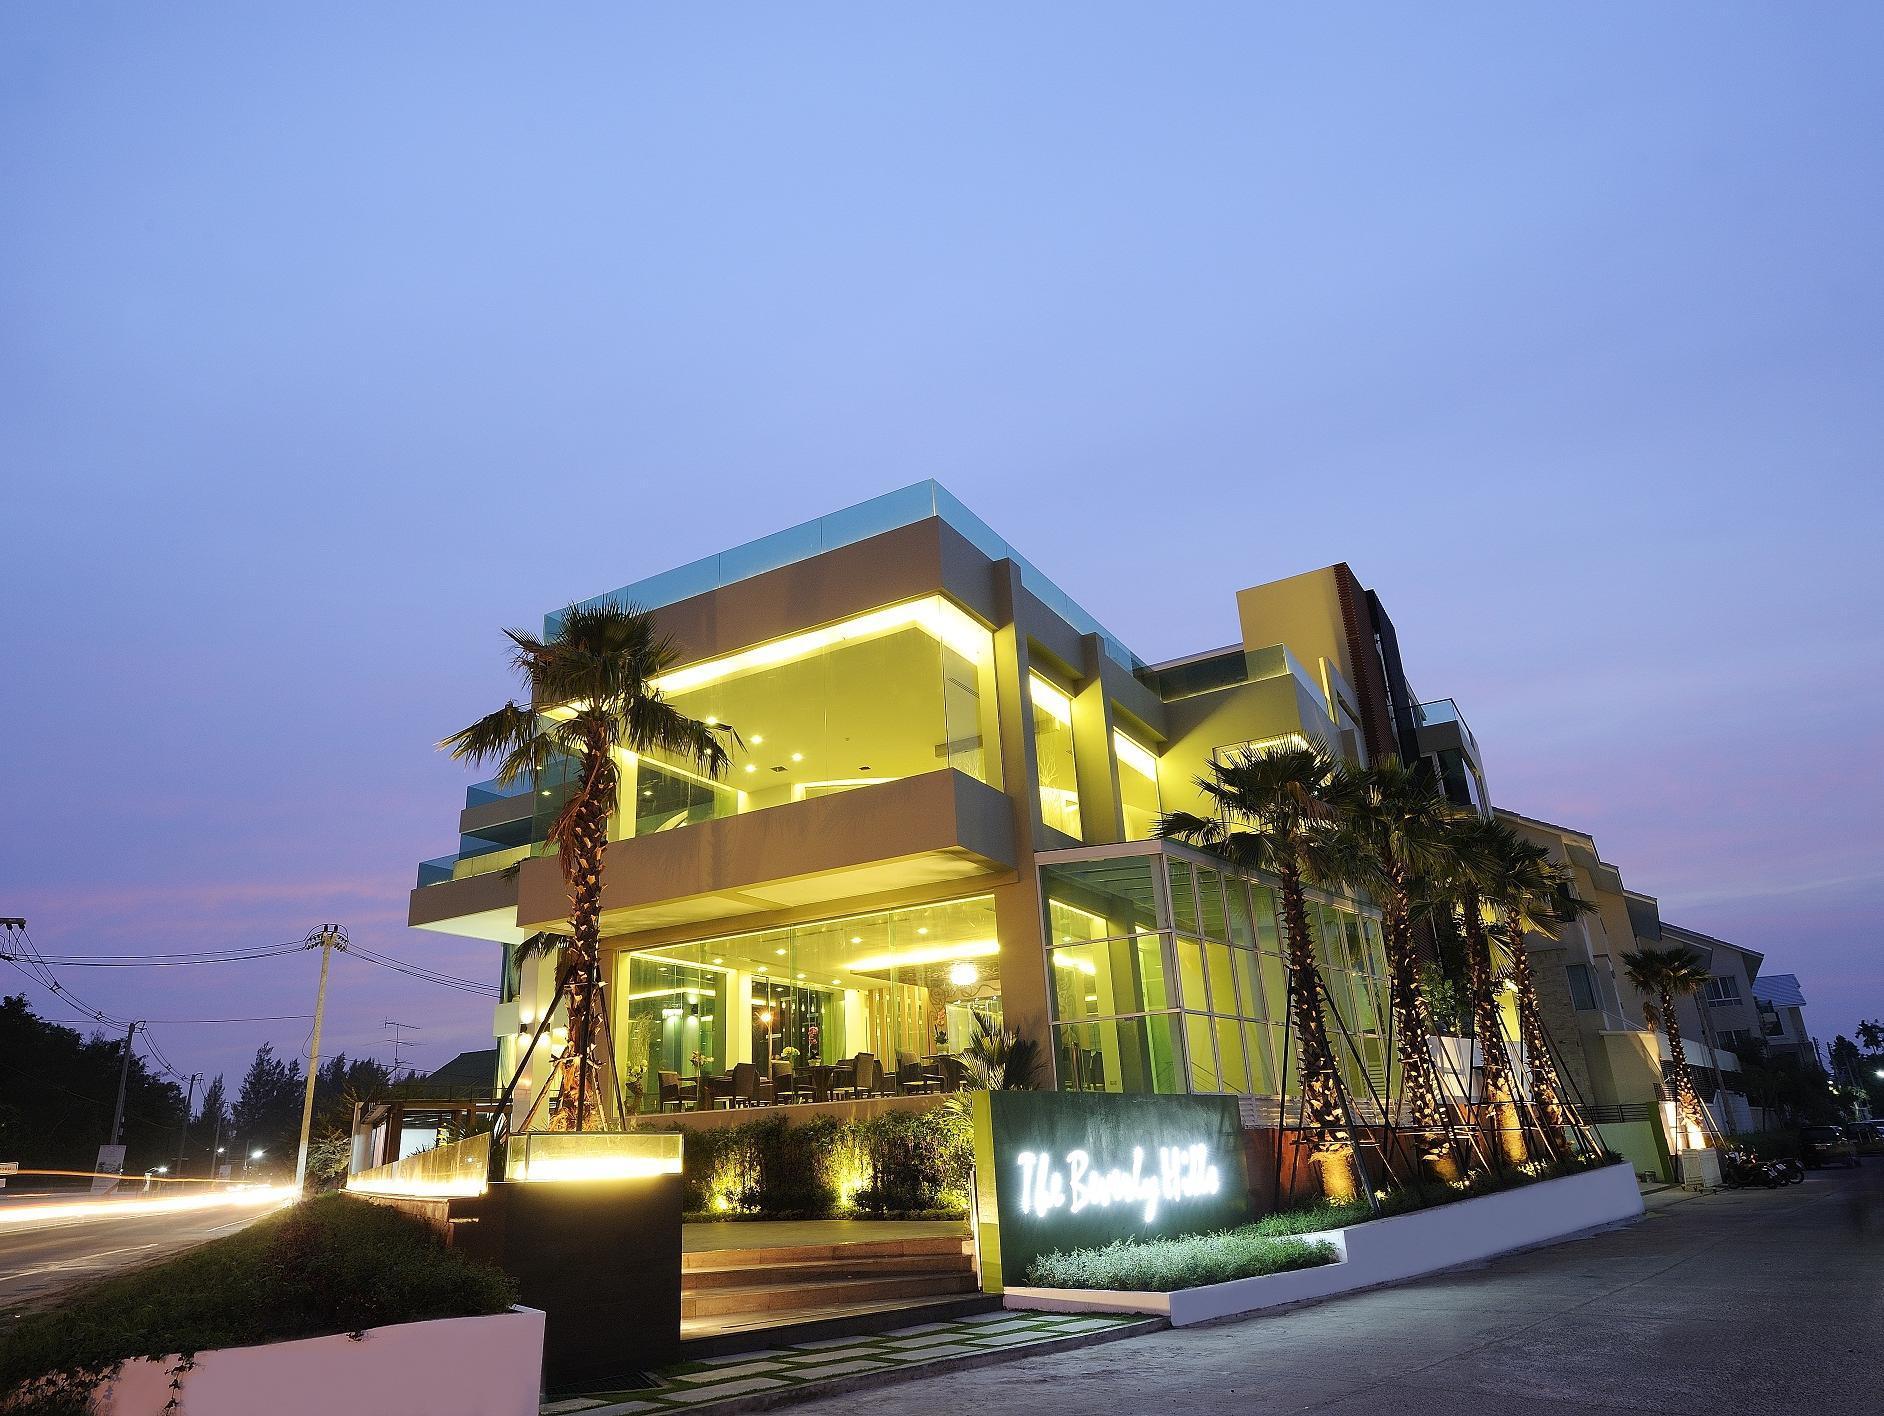 The Beverly Hills, Muang Nakhon Ratchasima